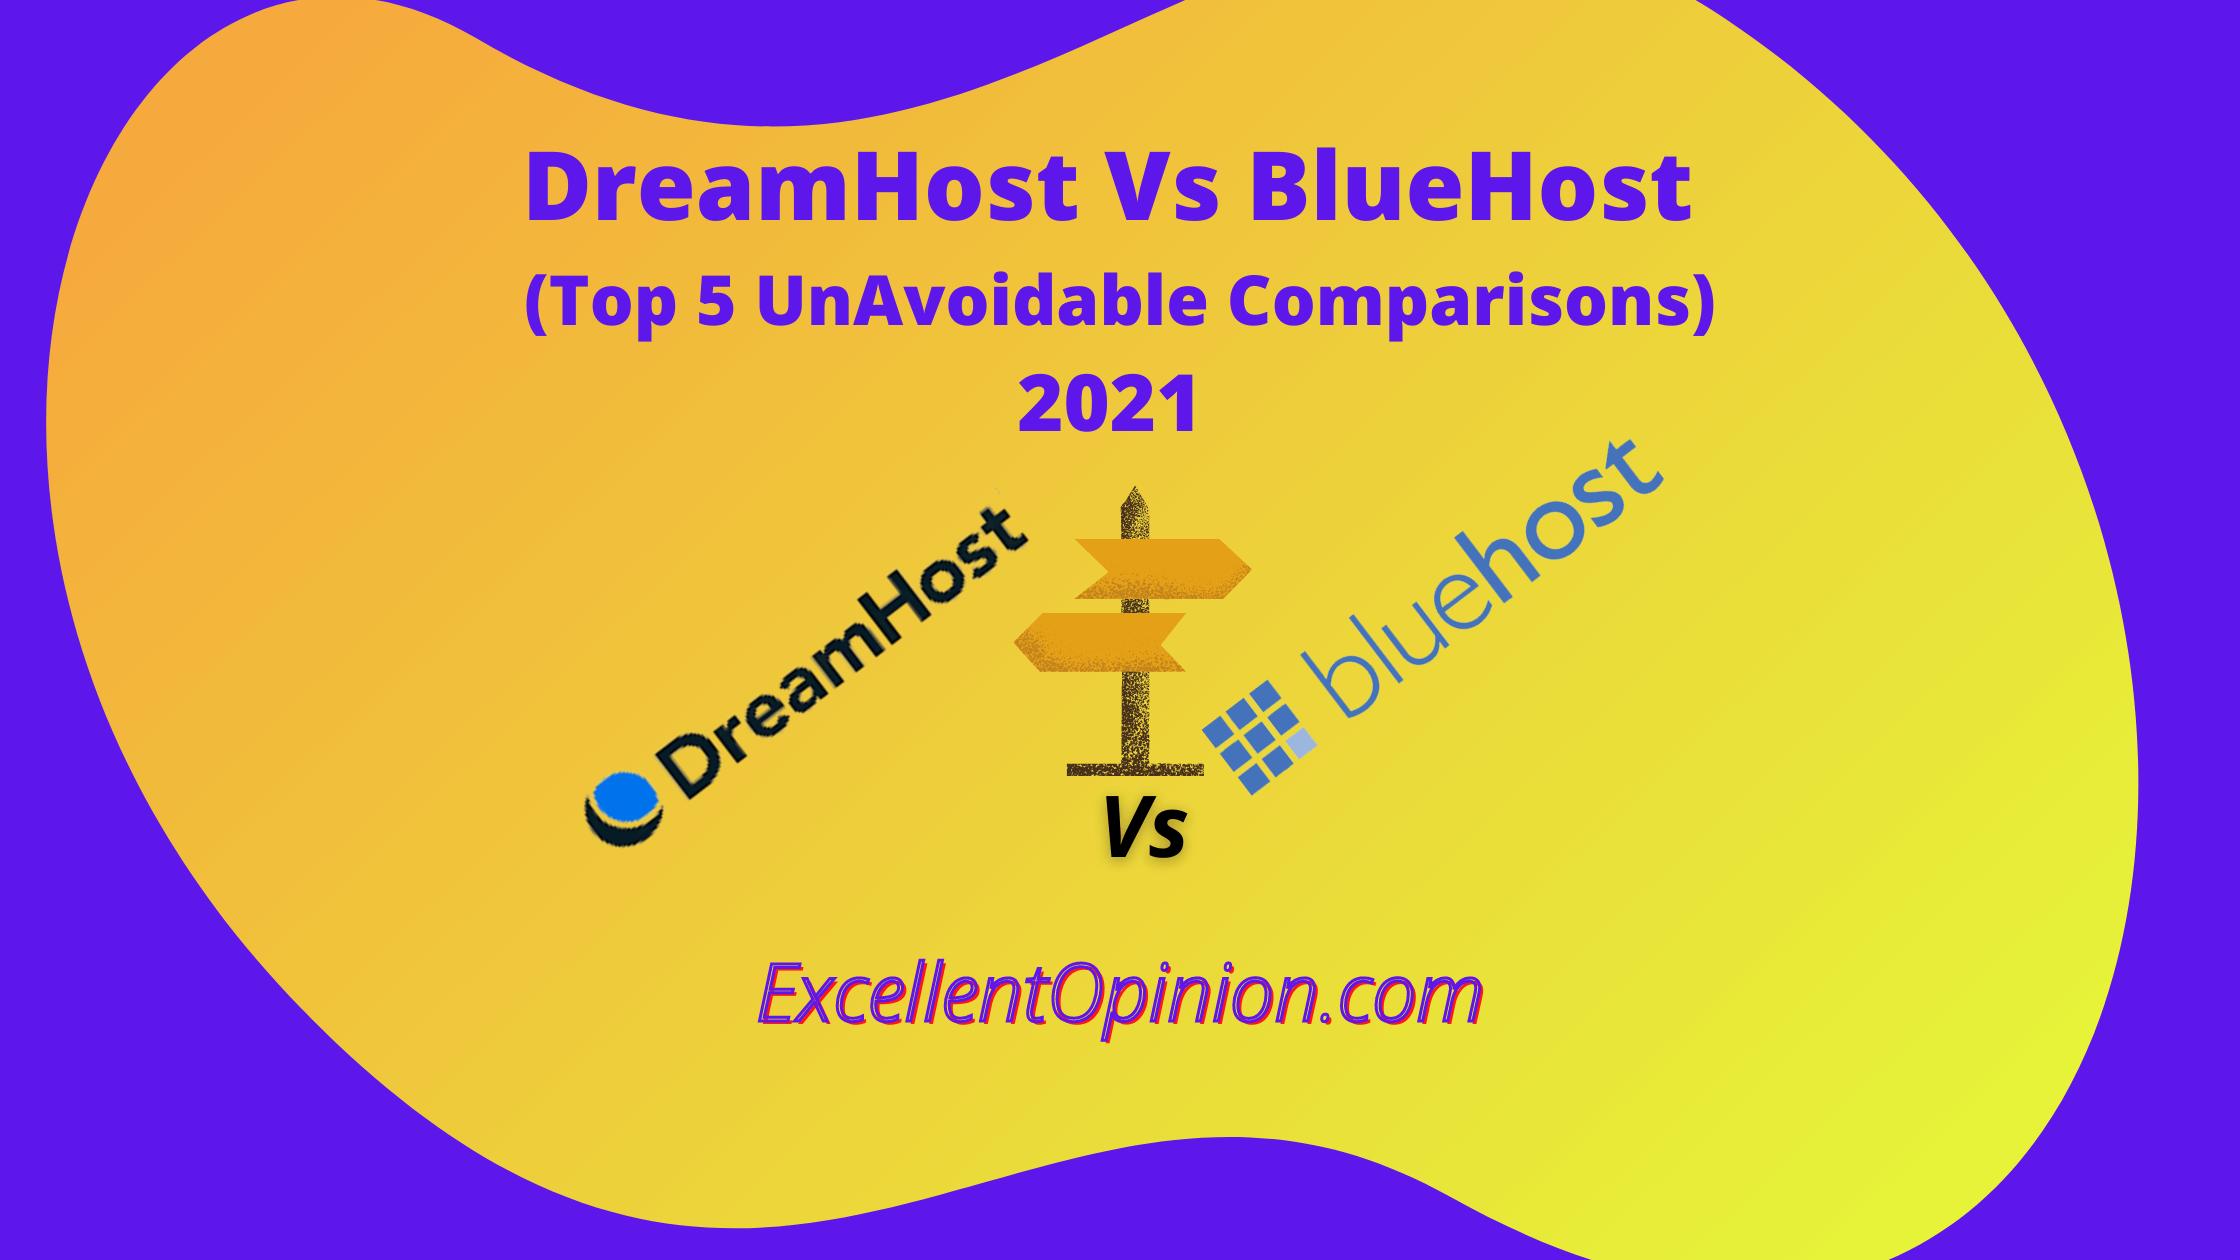 Dreamhost-vs-bluehost-reviews